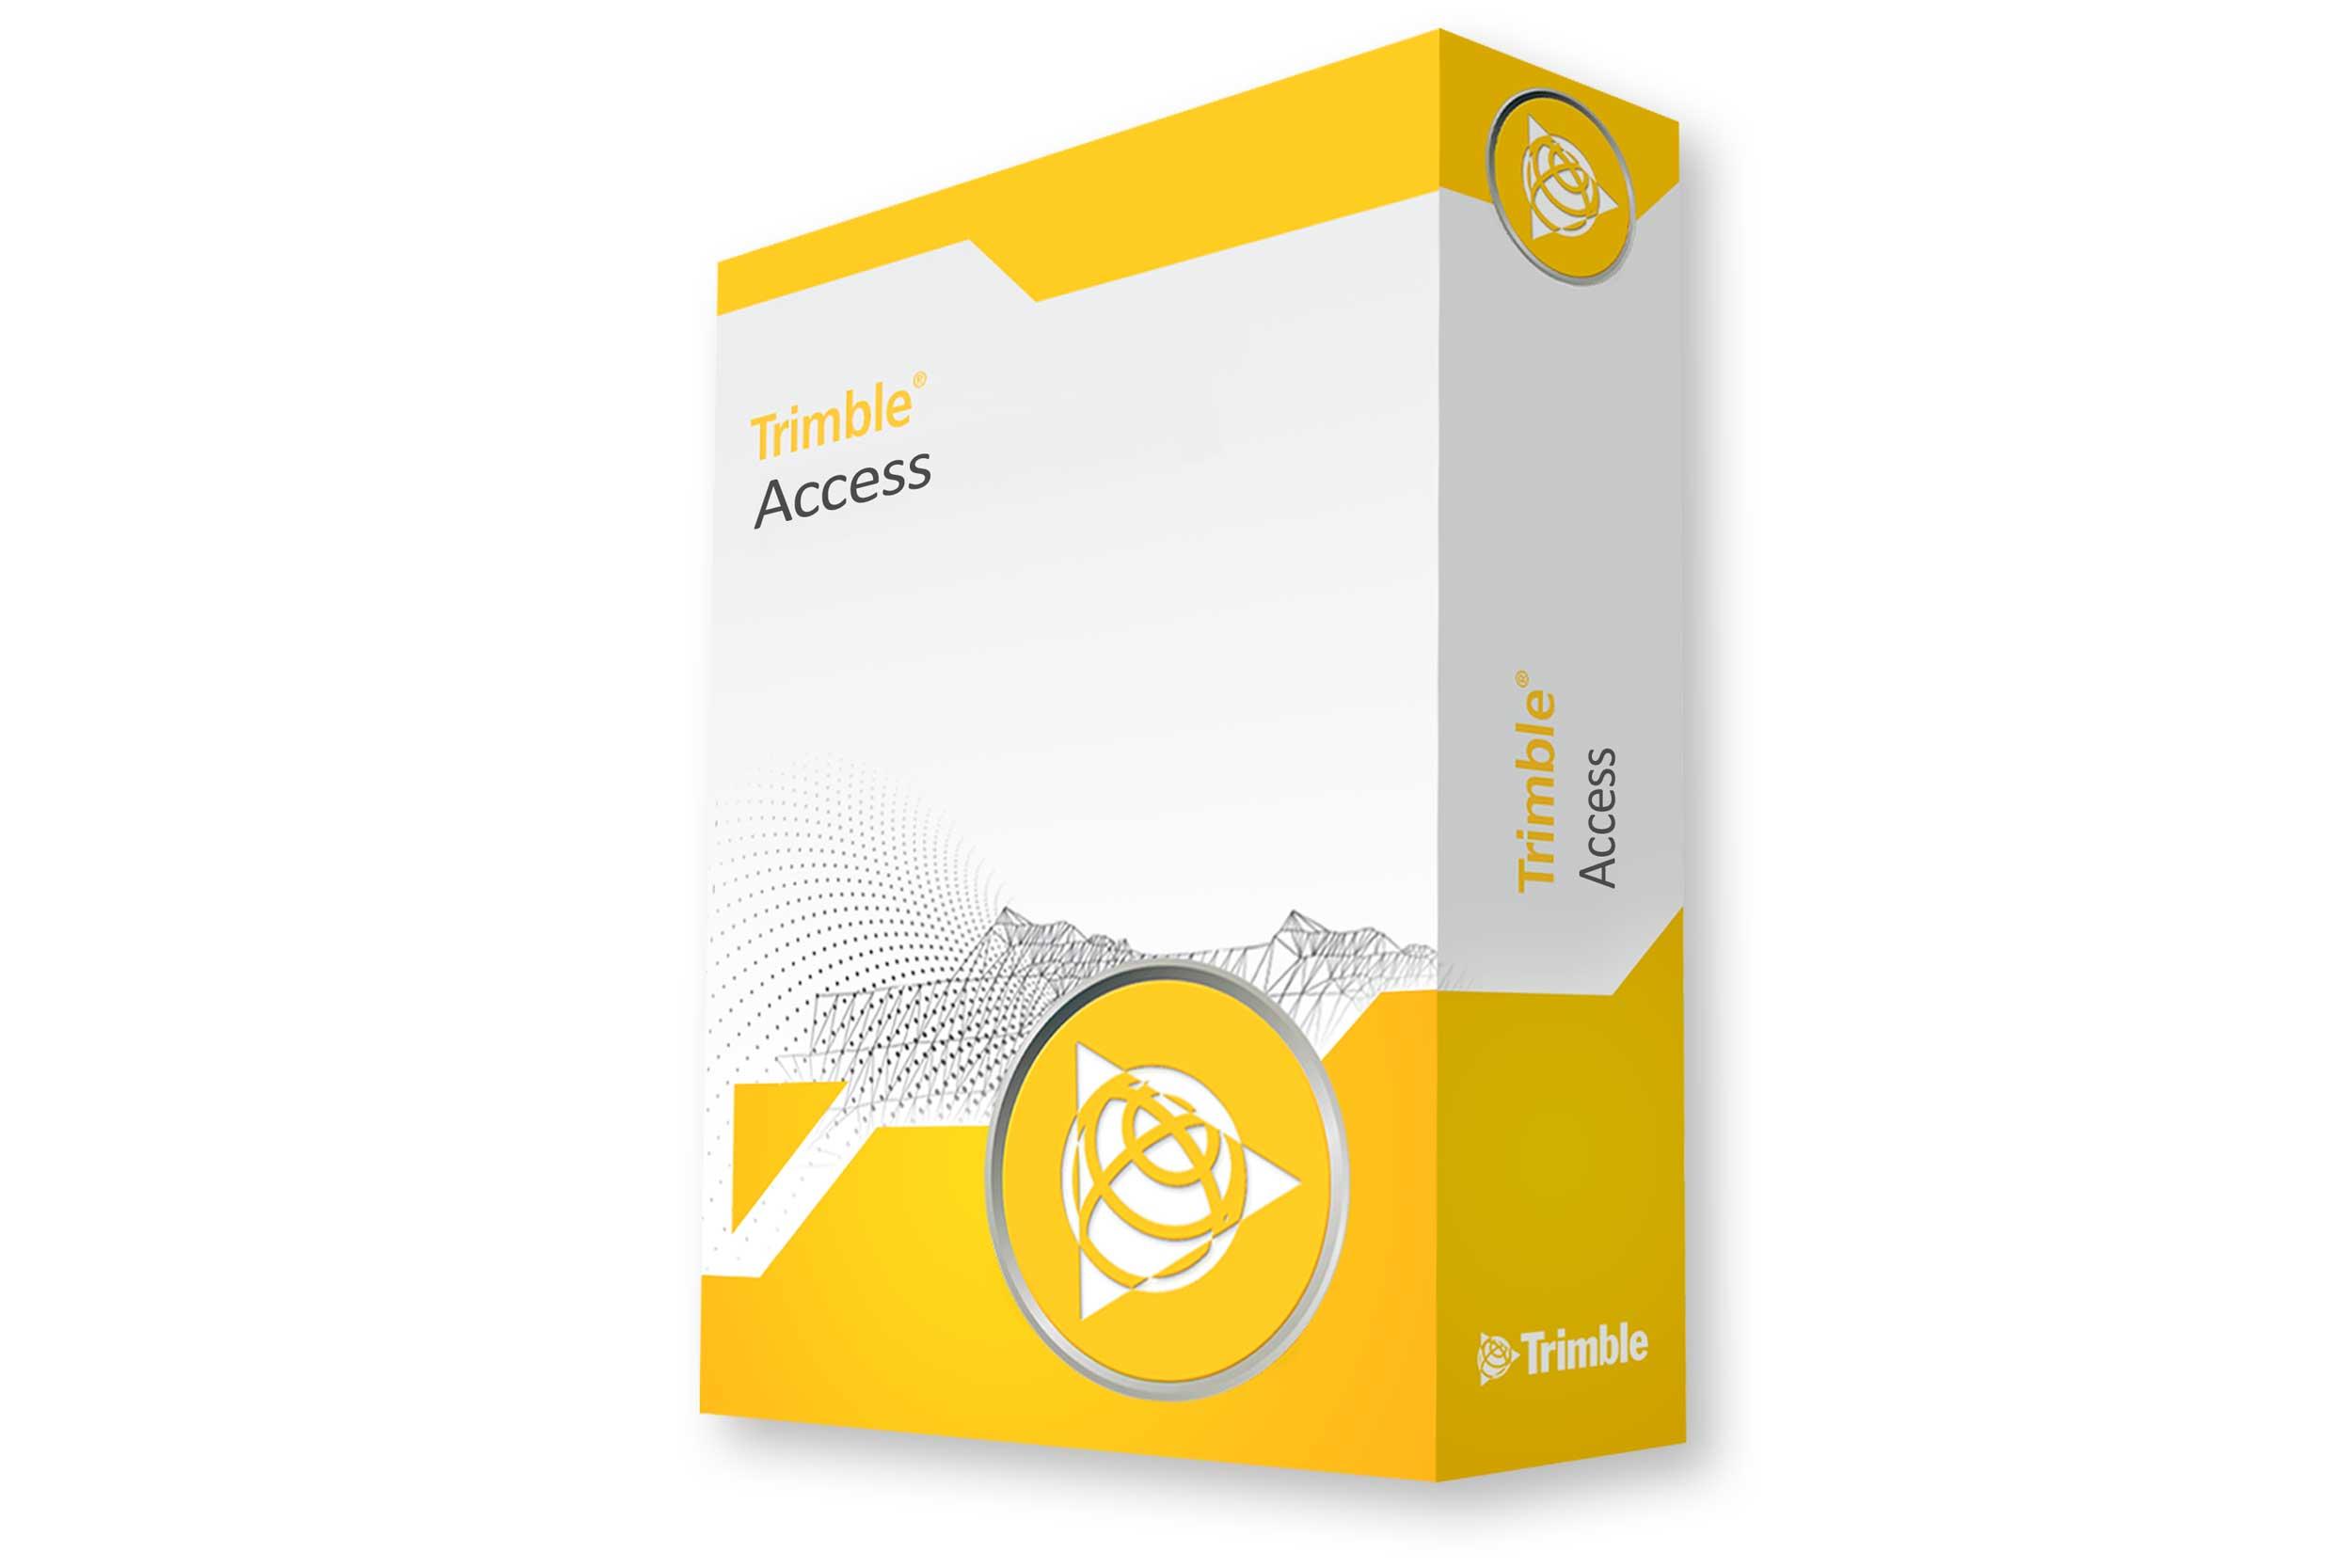 Feldsoftware Trimble Access